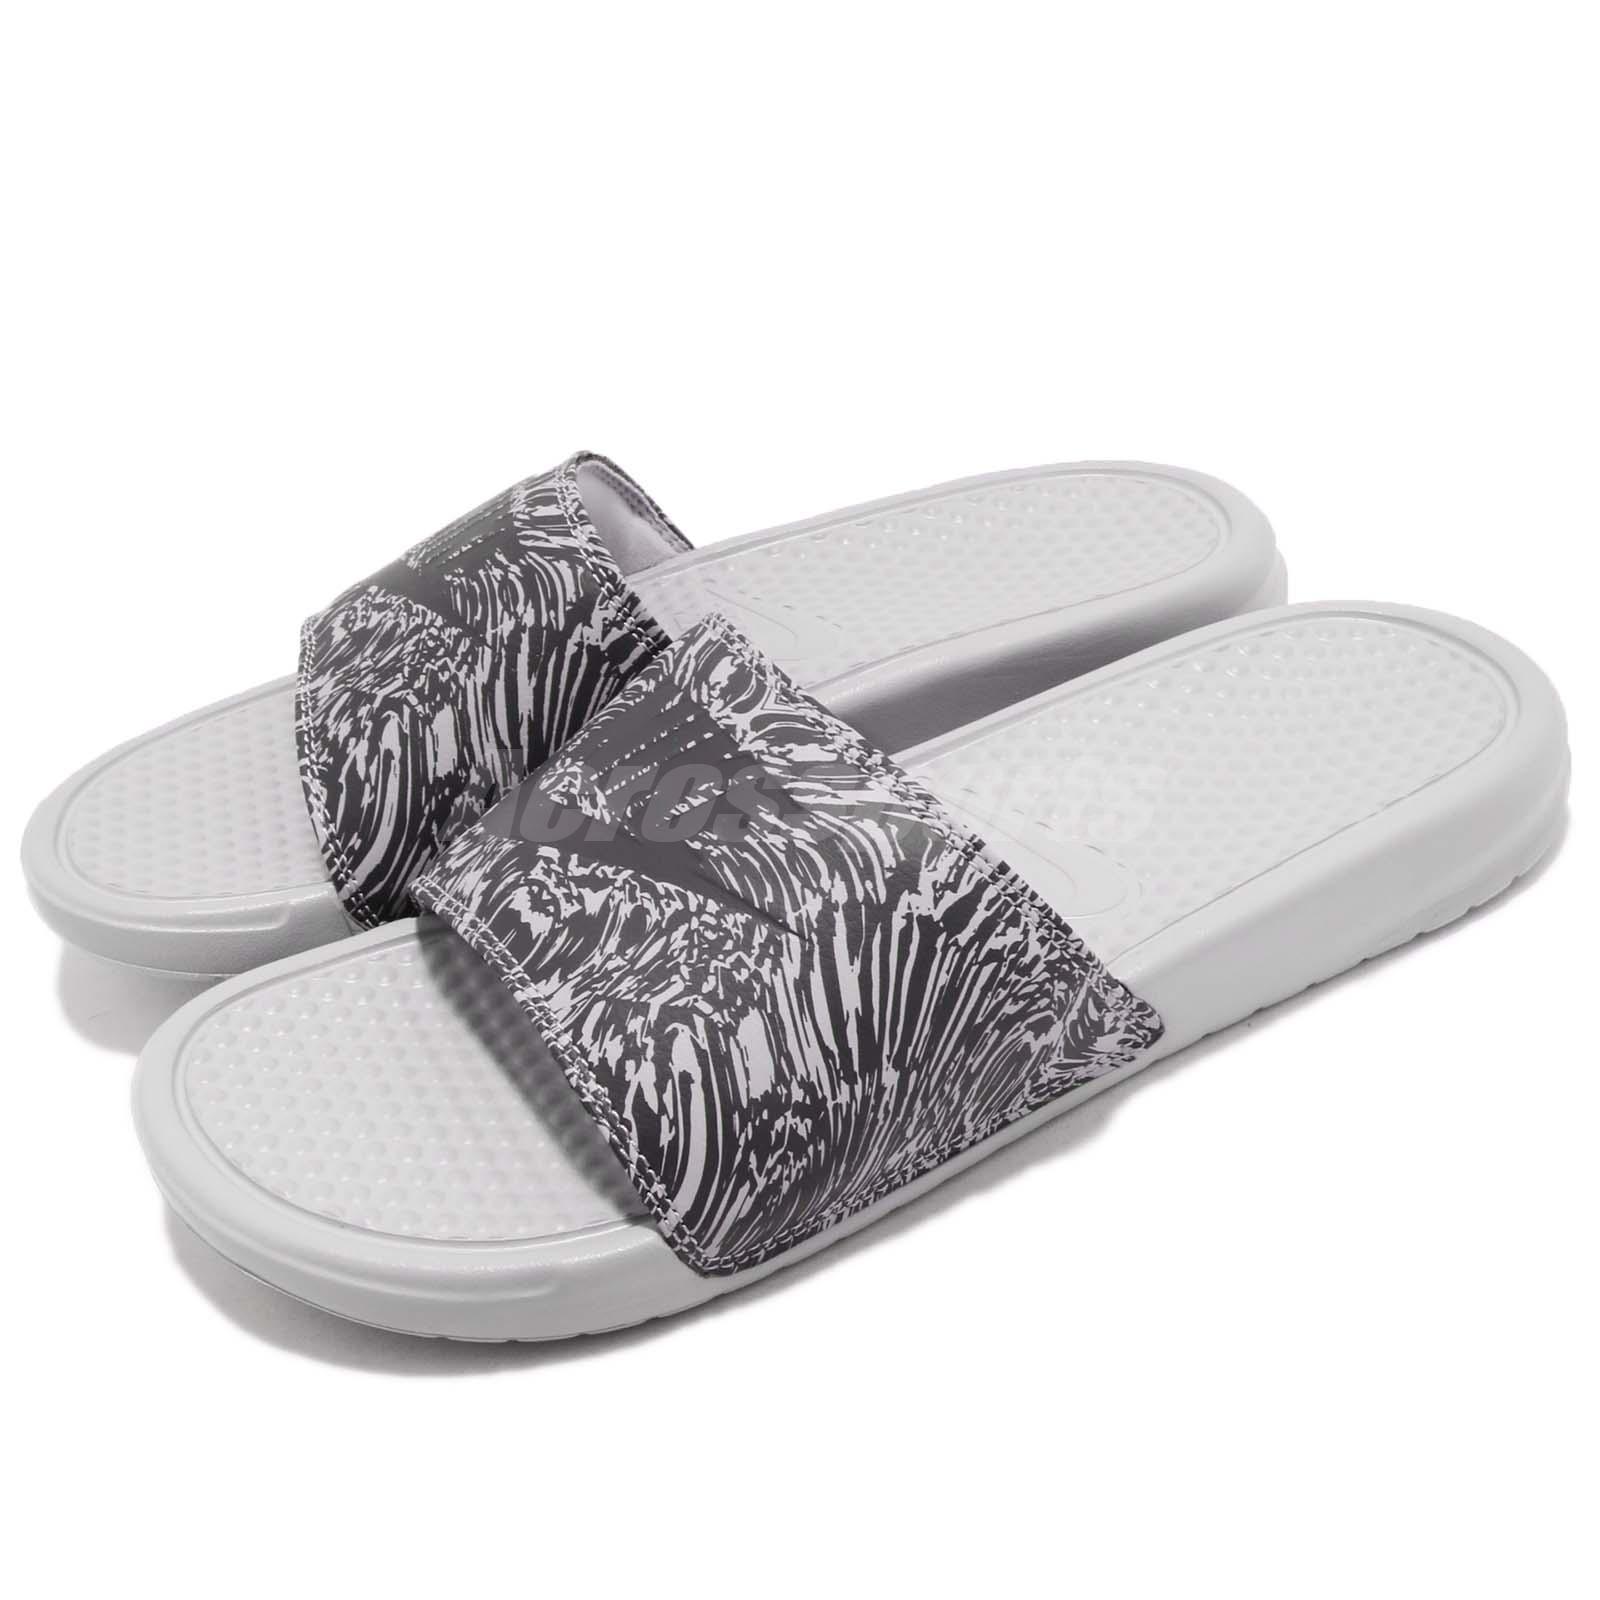 size 40 269ee 12682 Details about Nike Benassi JDI Print Grey Anthracite Men Sports Sandals  Slides 631261-005